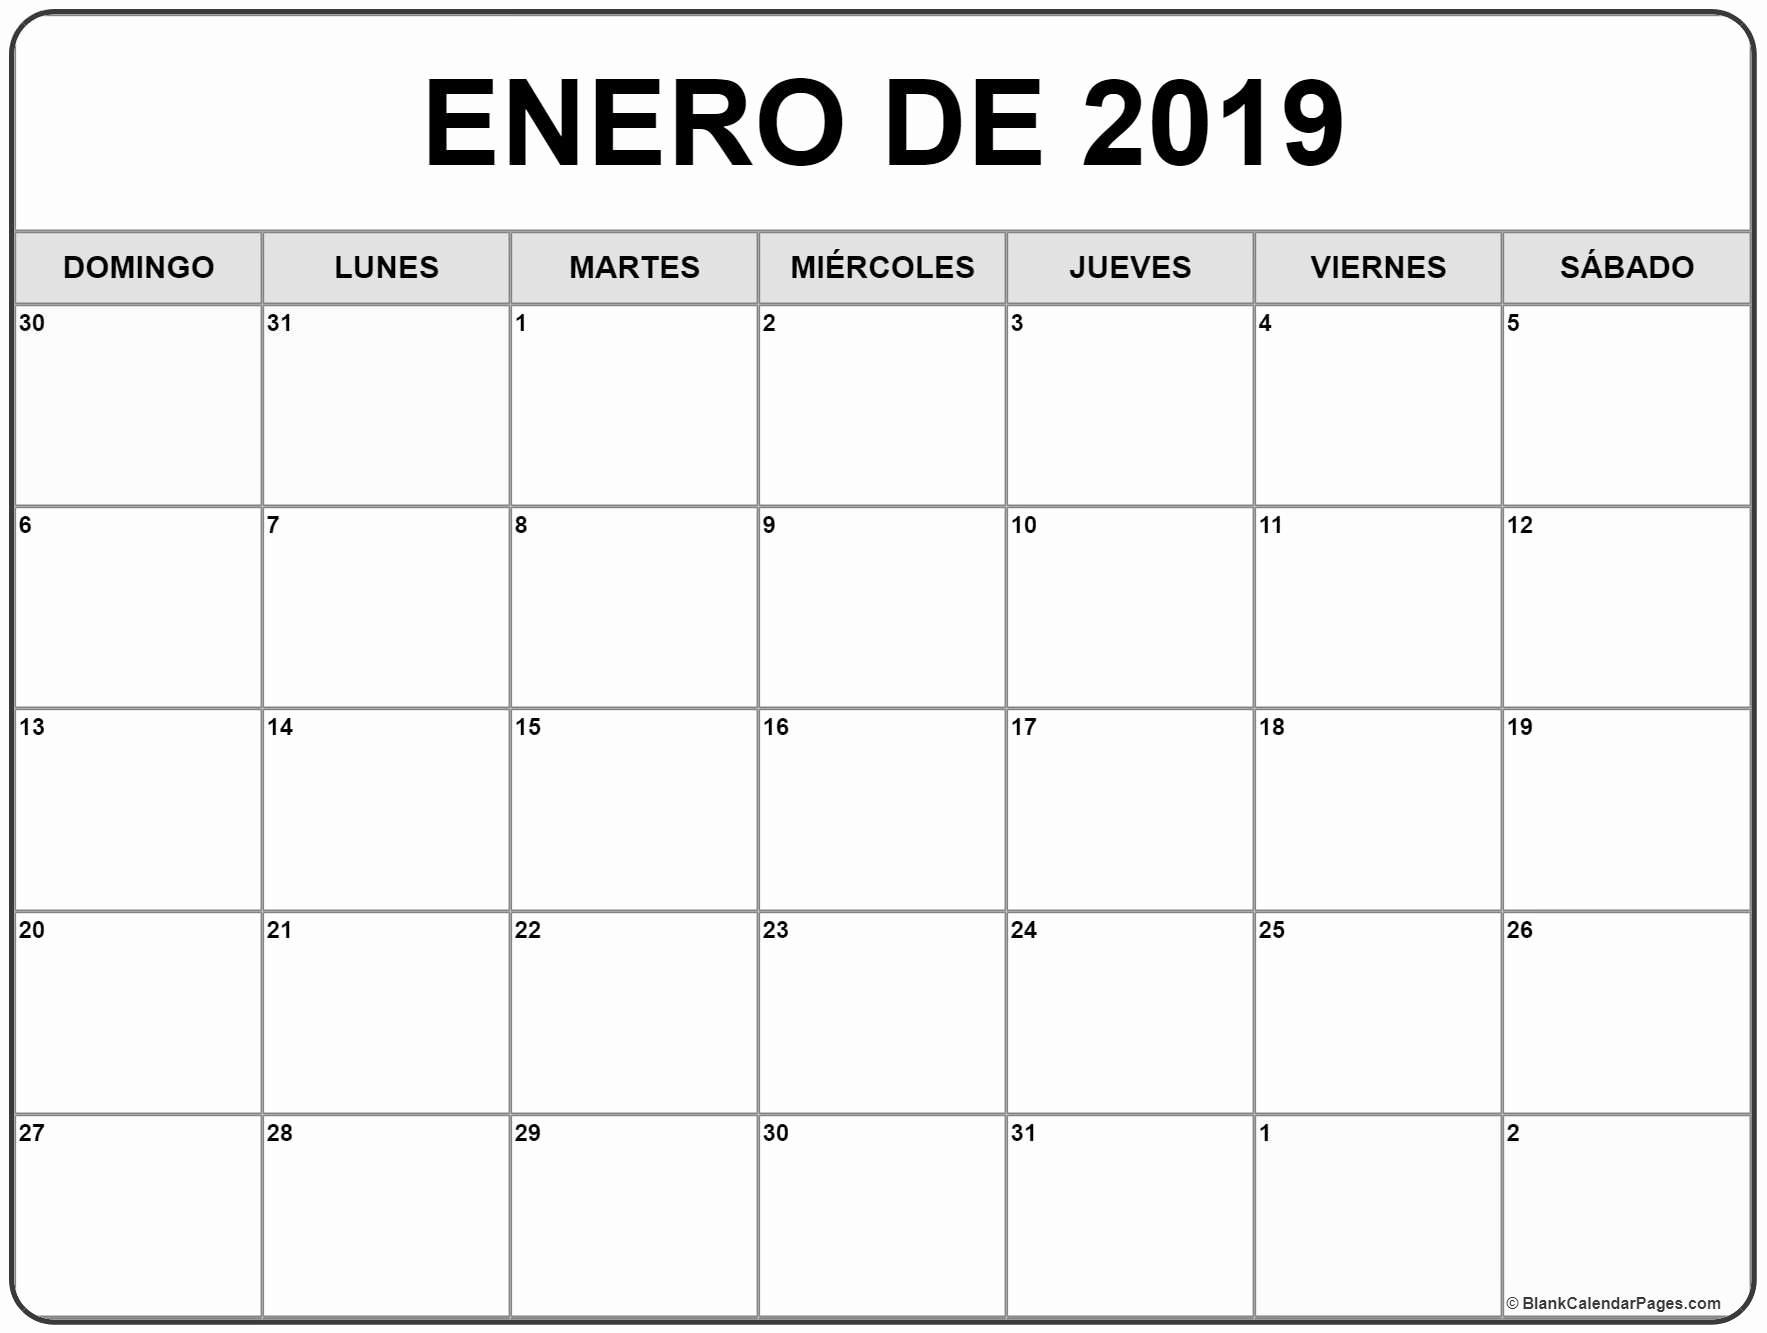 calendario 2019 mexico pdf recientes calendario dr 2019 enero de 2019 calendario gratis calendario de of calendario 2019 mexico pdf